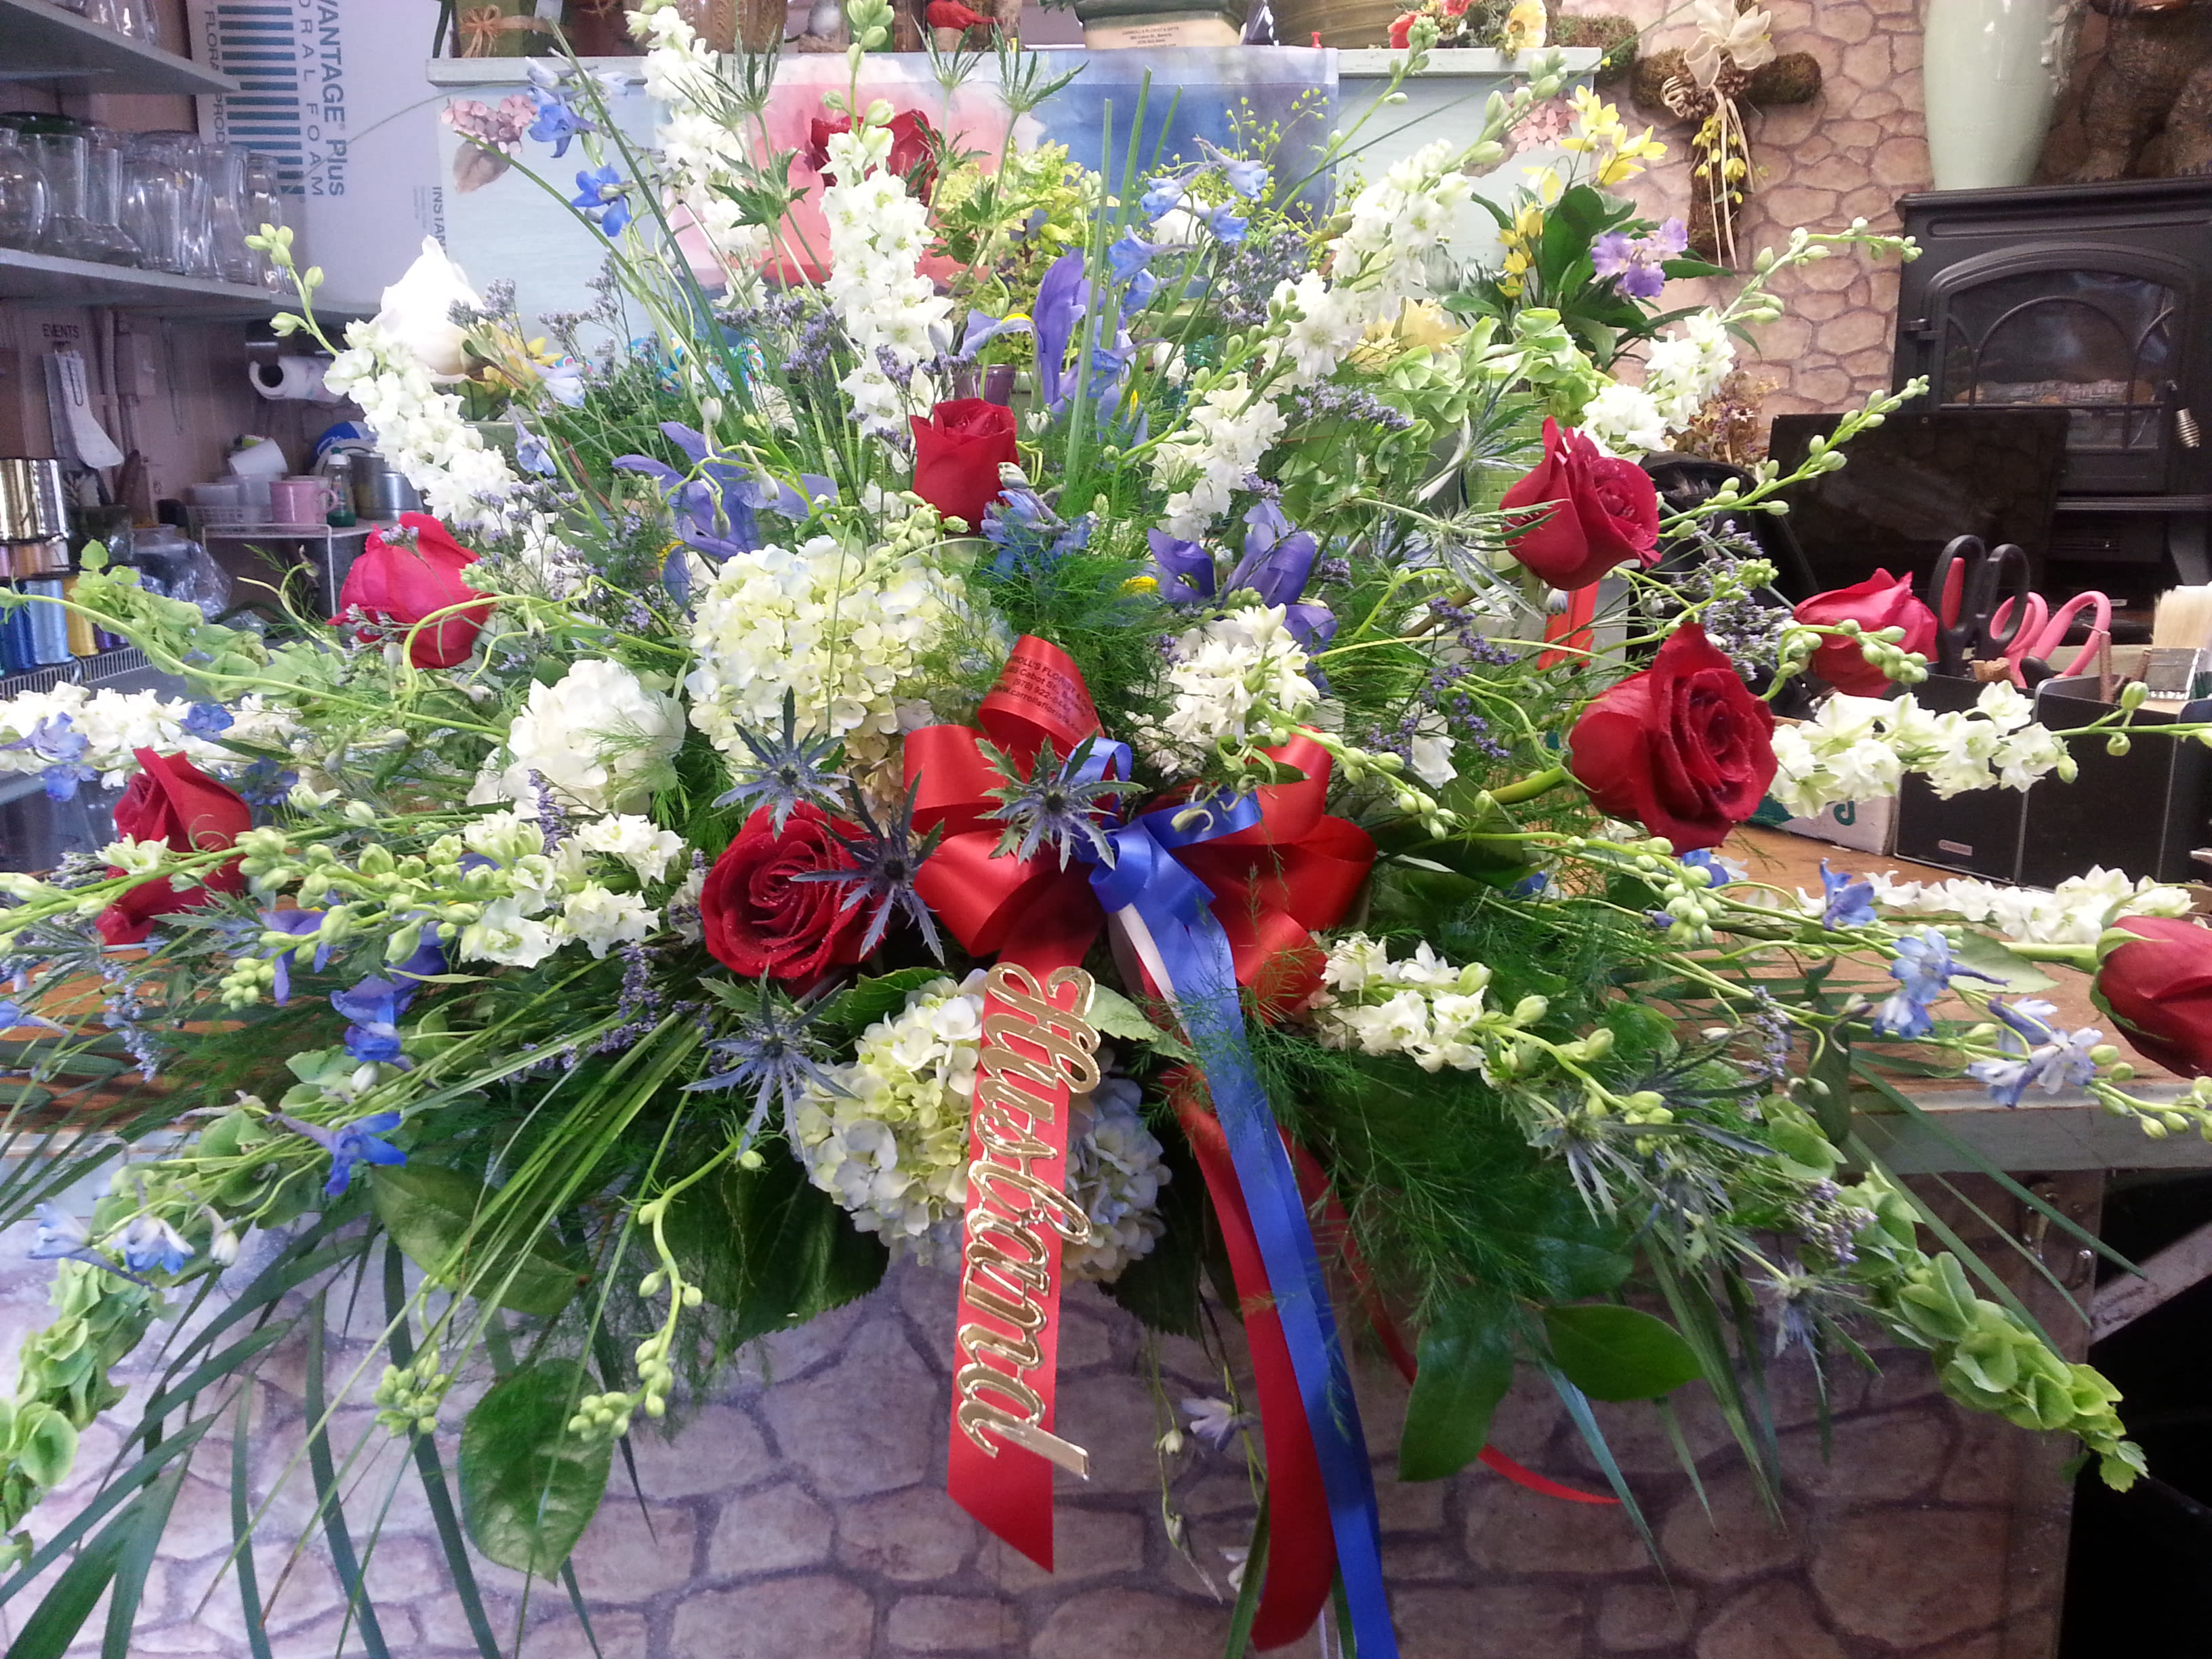 Military/Patriotic Funeral Casket/Blanket Cover